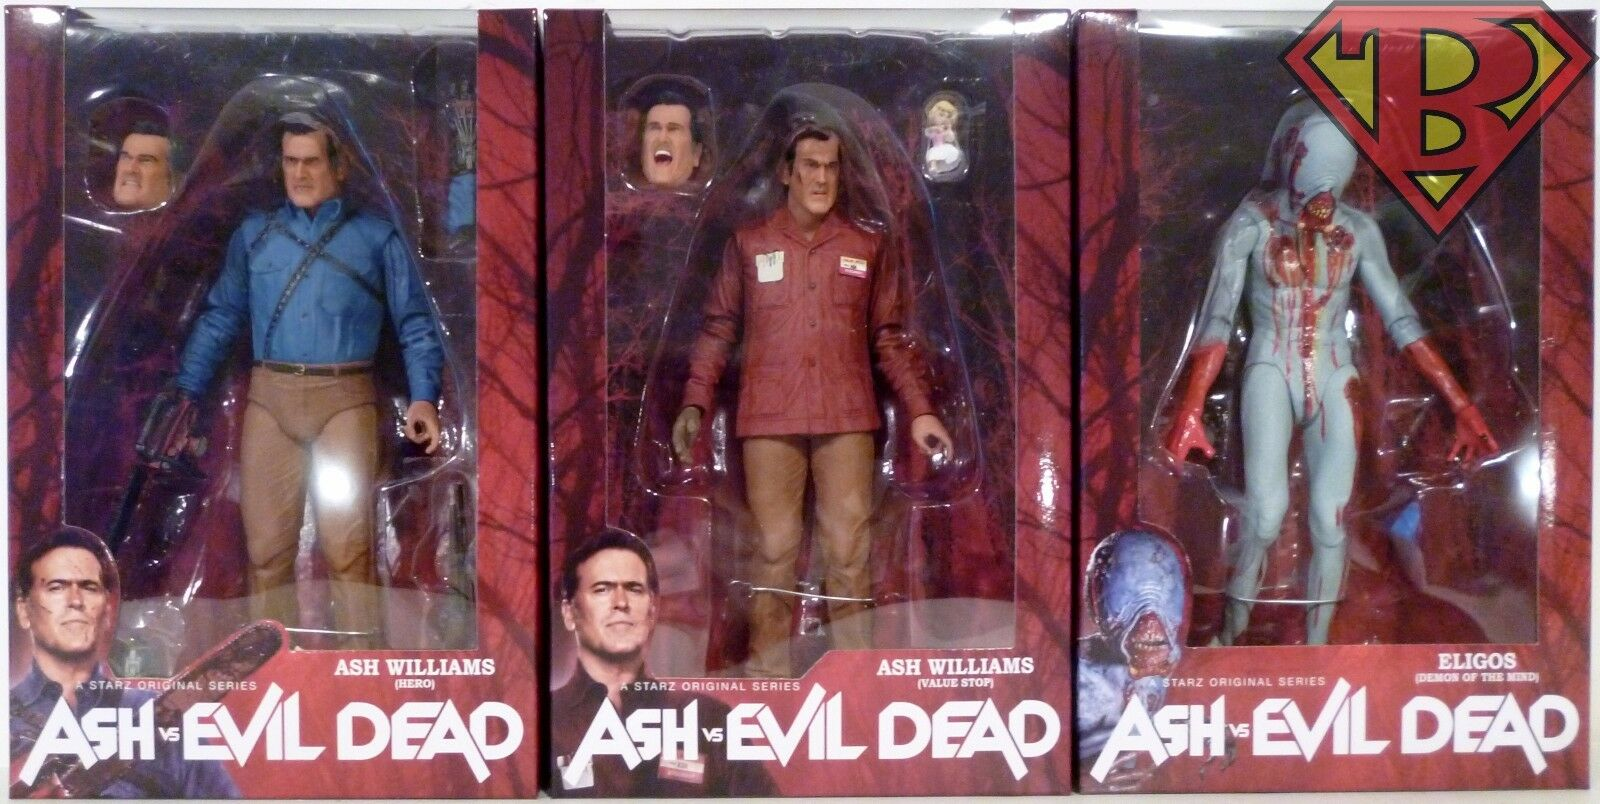 ASH vs EVIL DEAD 7